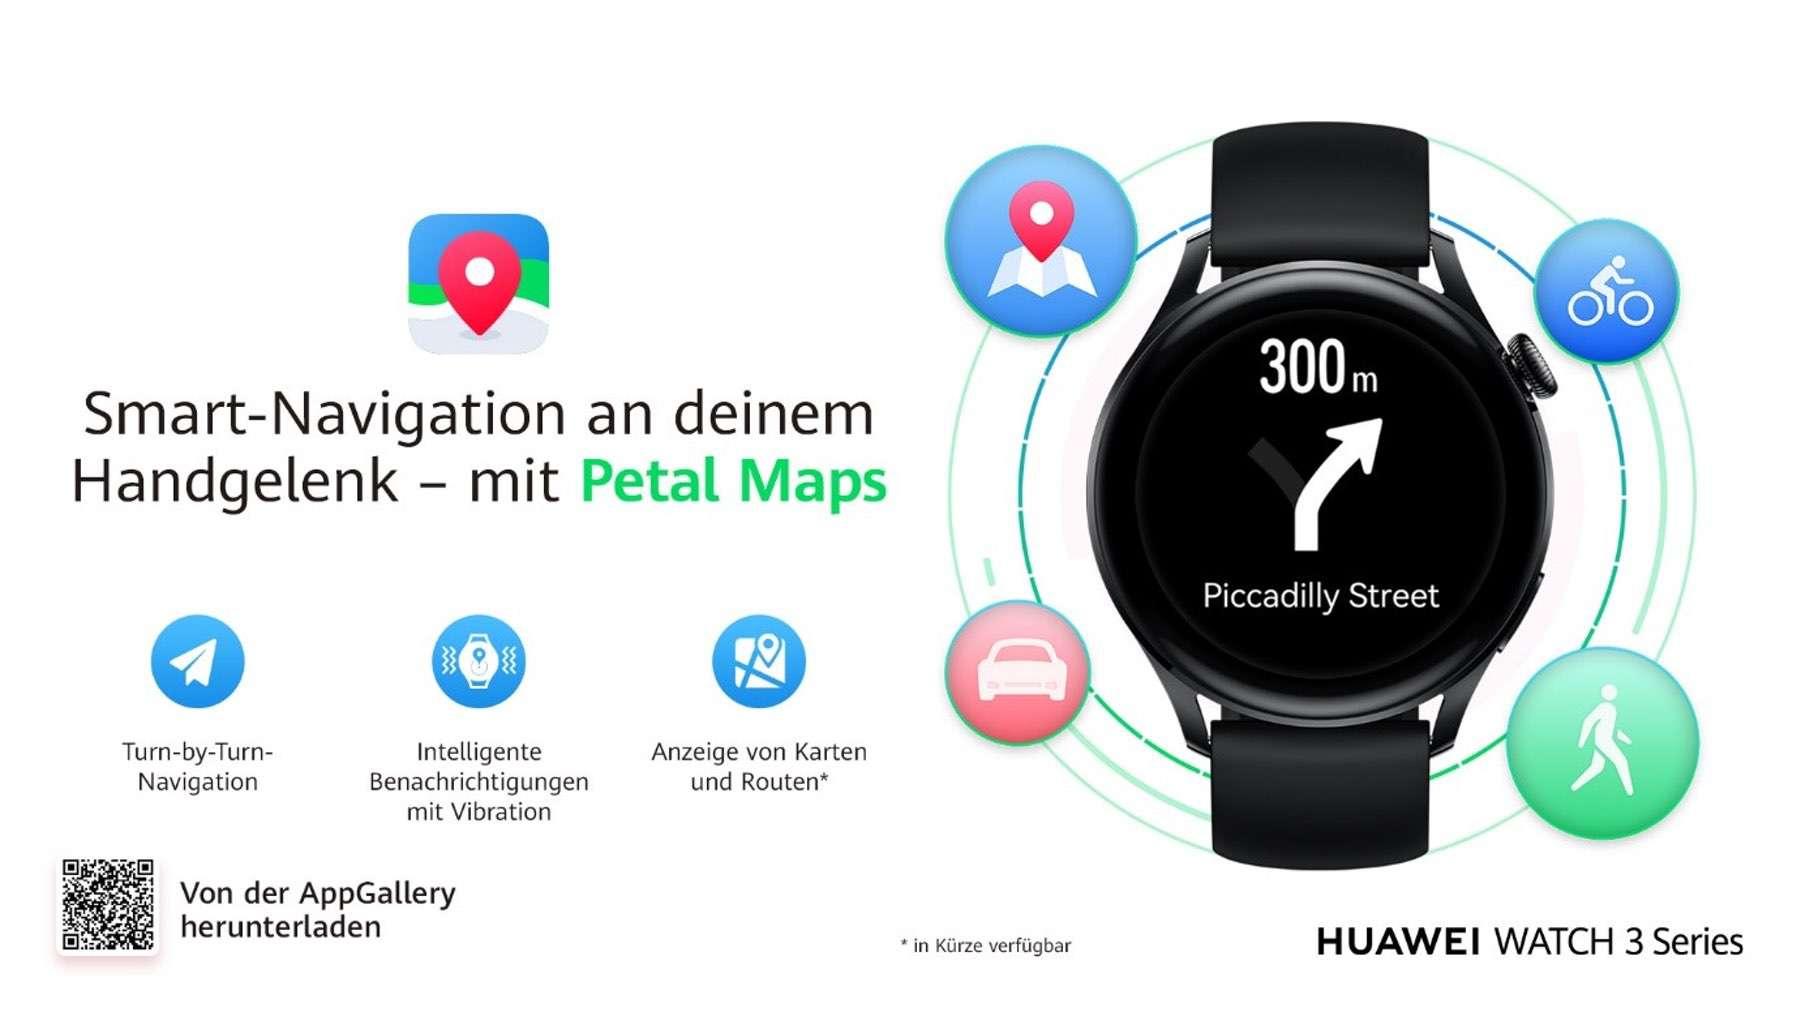 Petal Maps auf der Huawei Watch 3 verfügbar